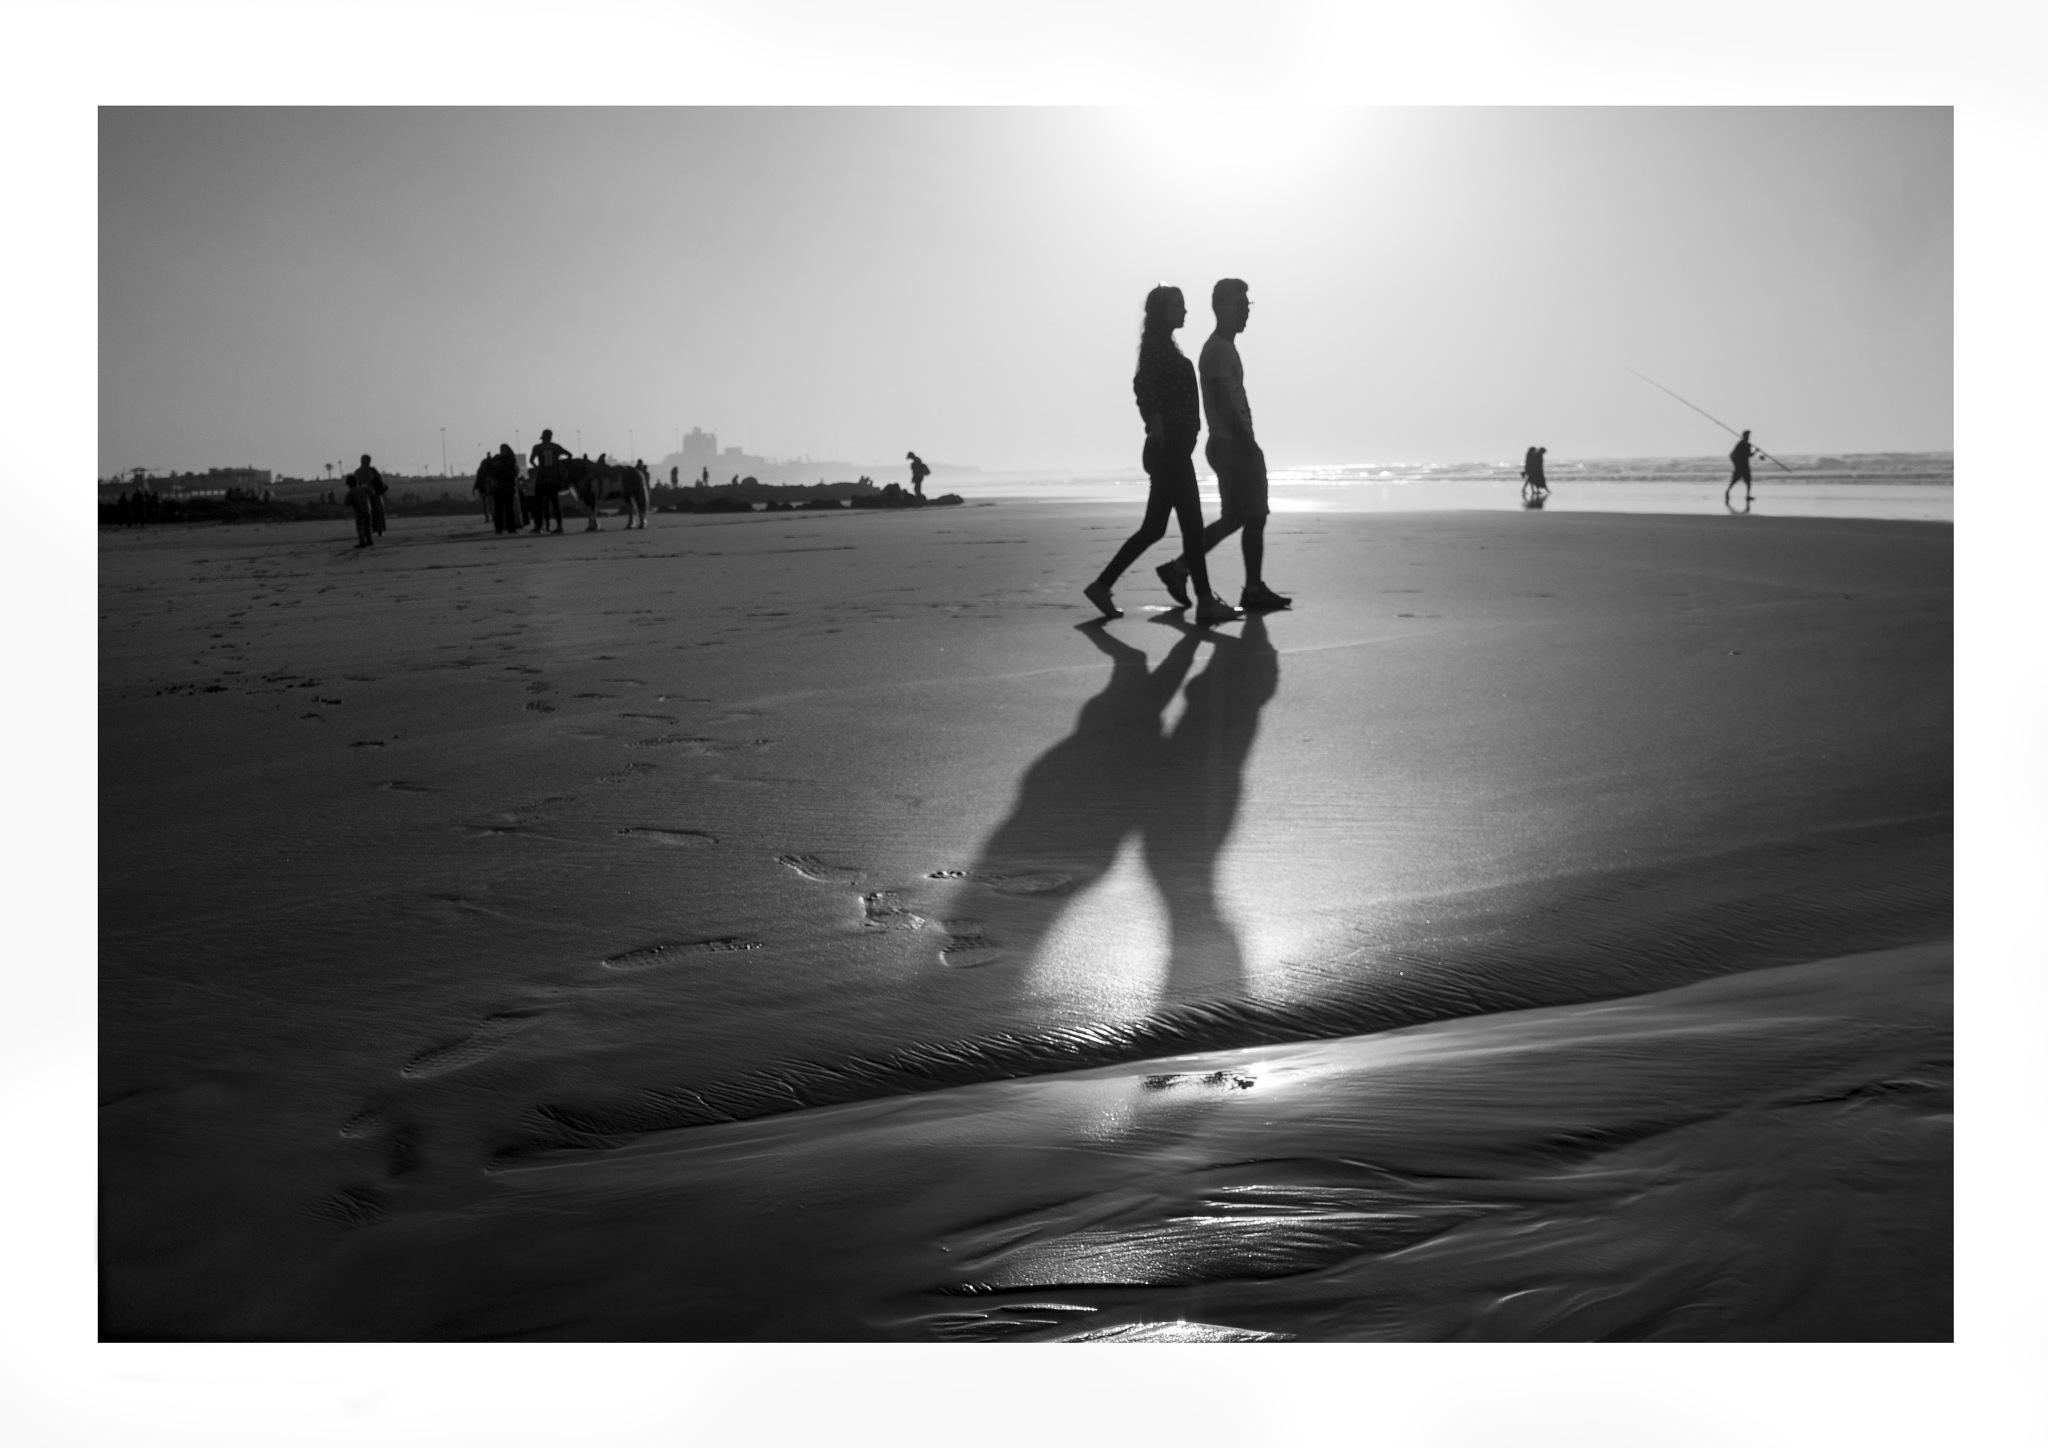 Love in the shadows by Adl Bahmane